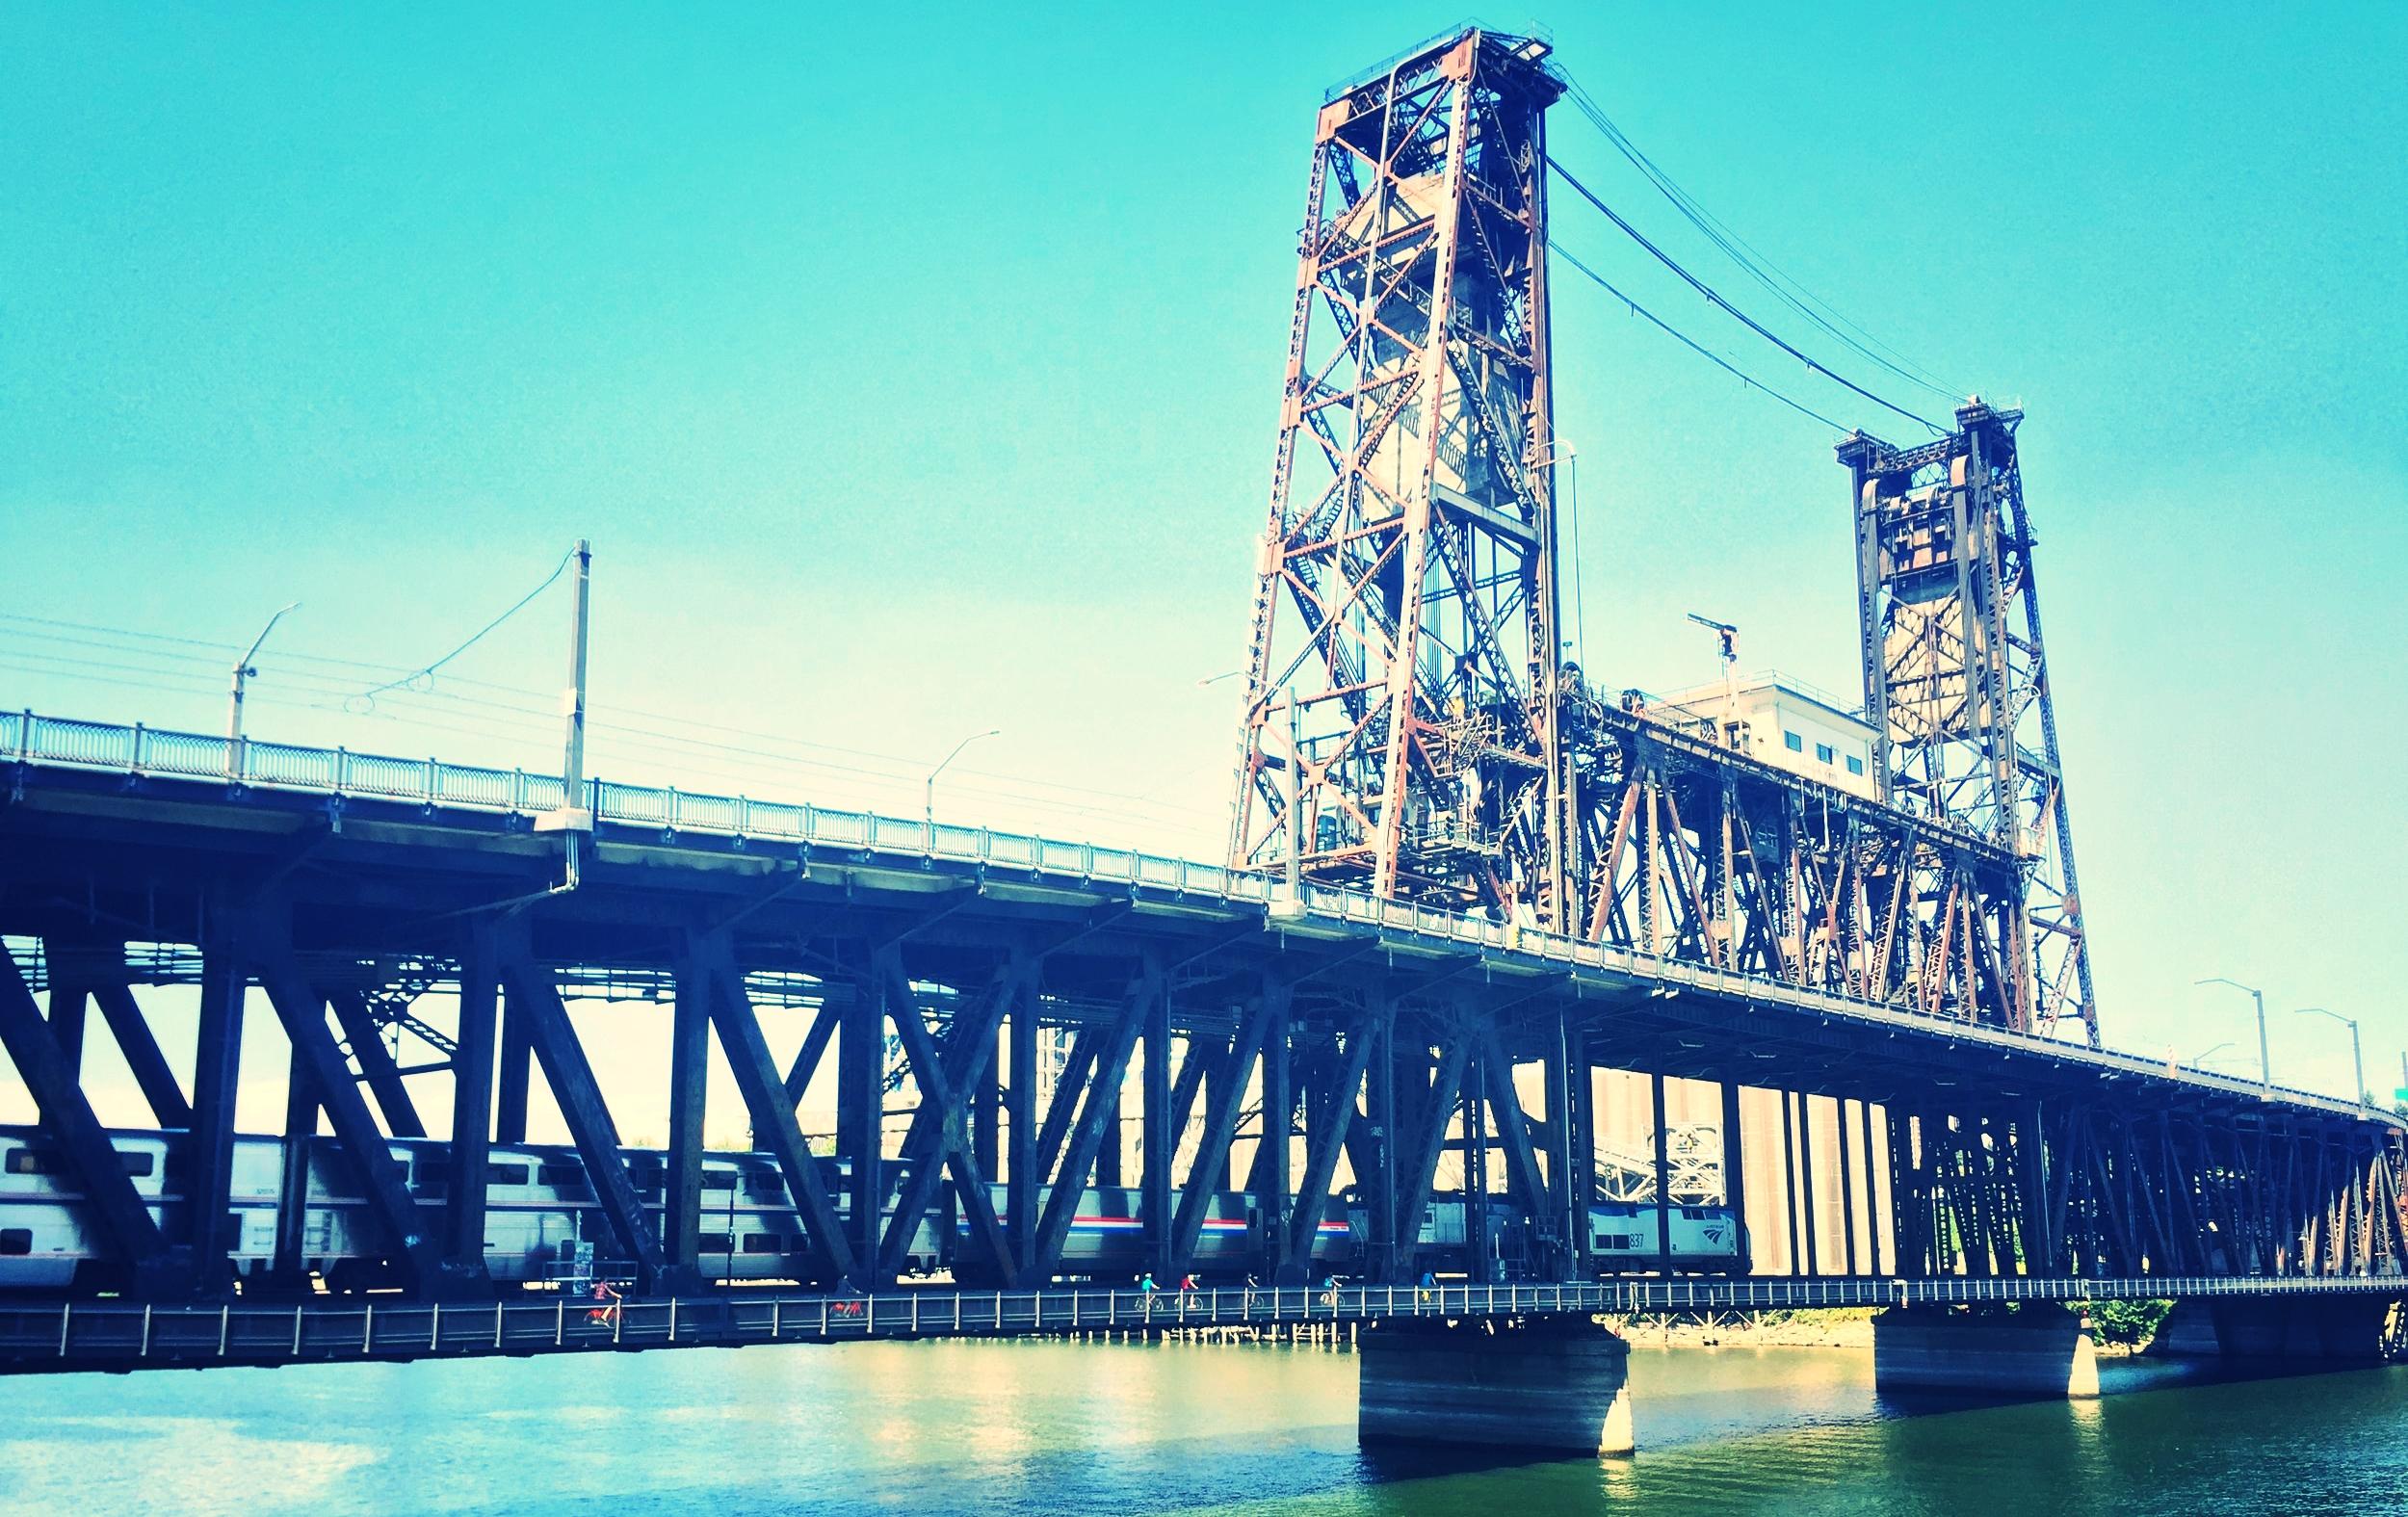 Bikabout-Portland-Steel-Bridge-2.JPG